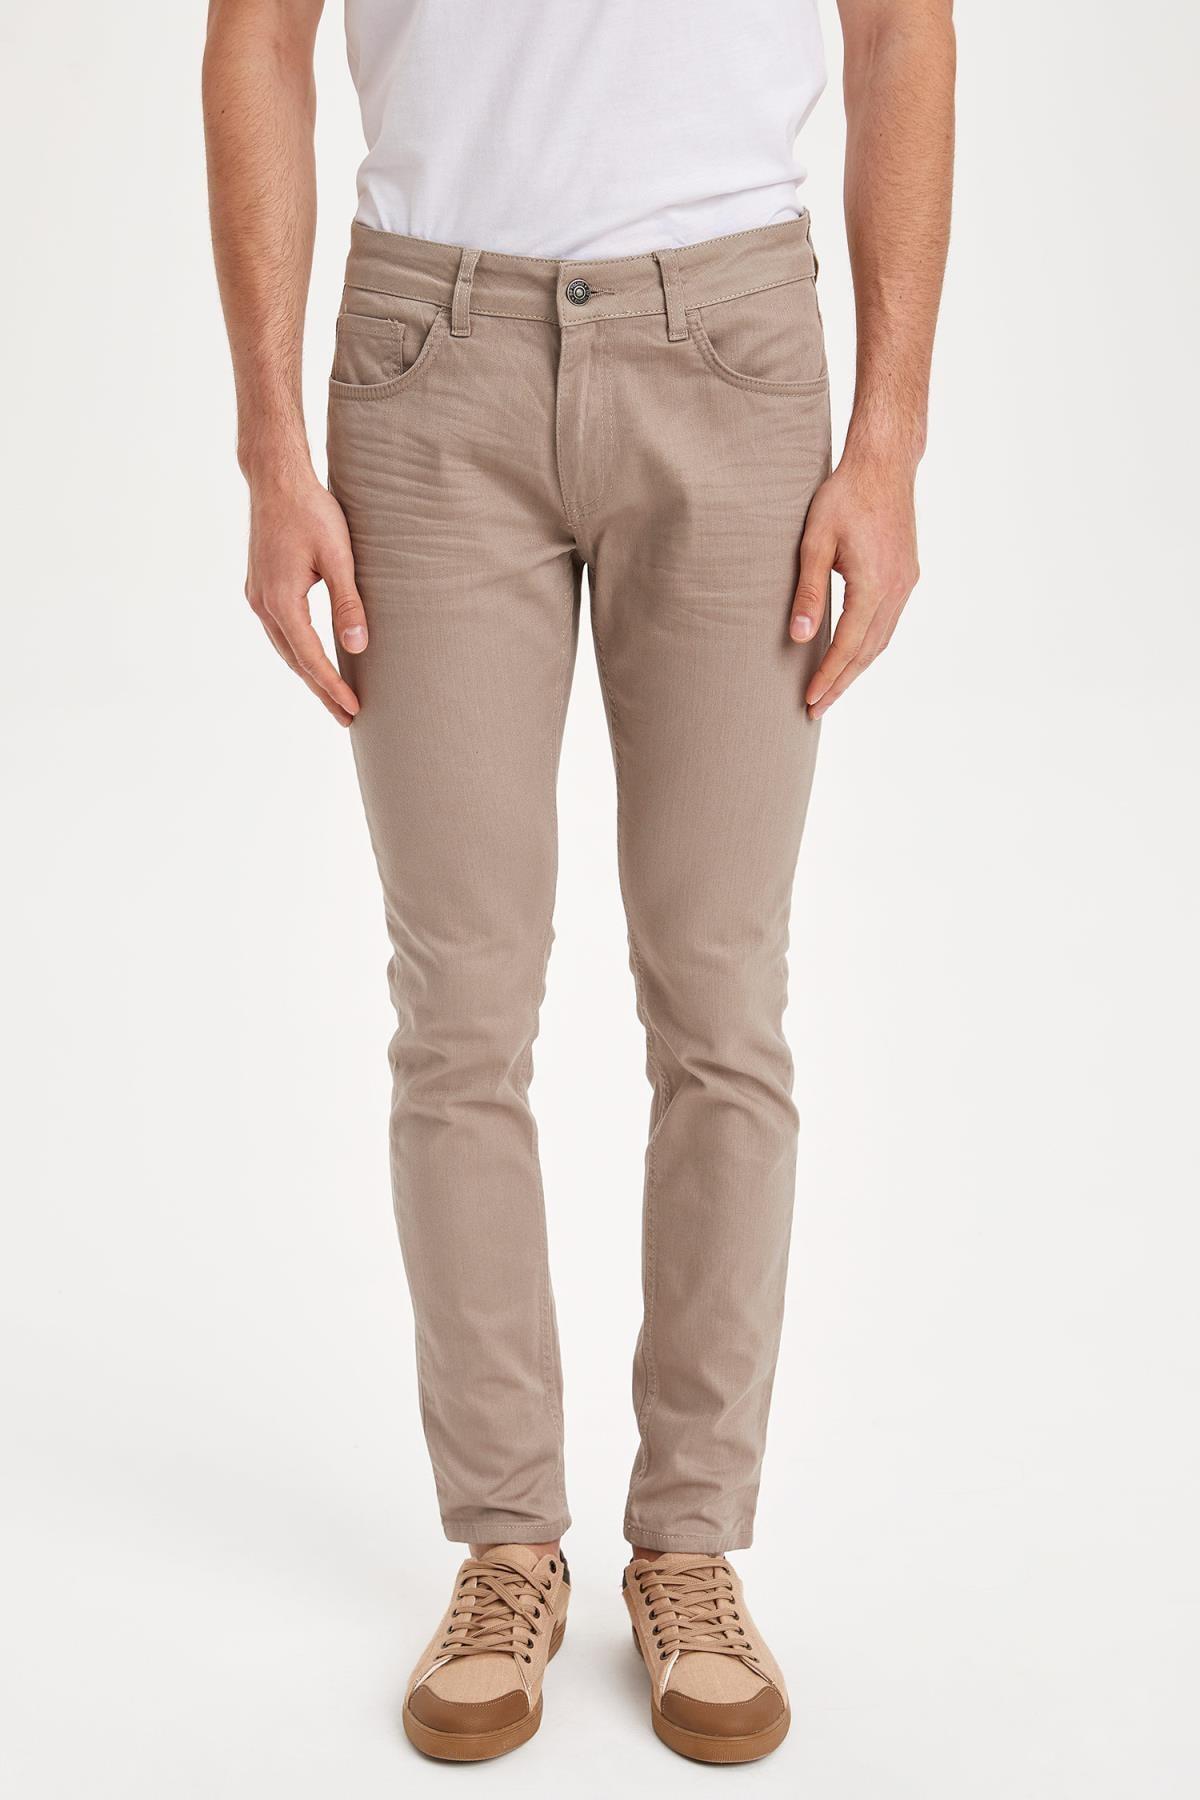 DeFacto Erkek Bej Carlo Skinny Fit Pantolon L3403AZ.19SM.BG151 2